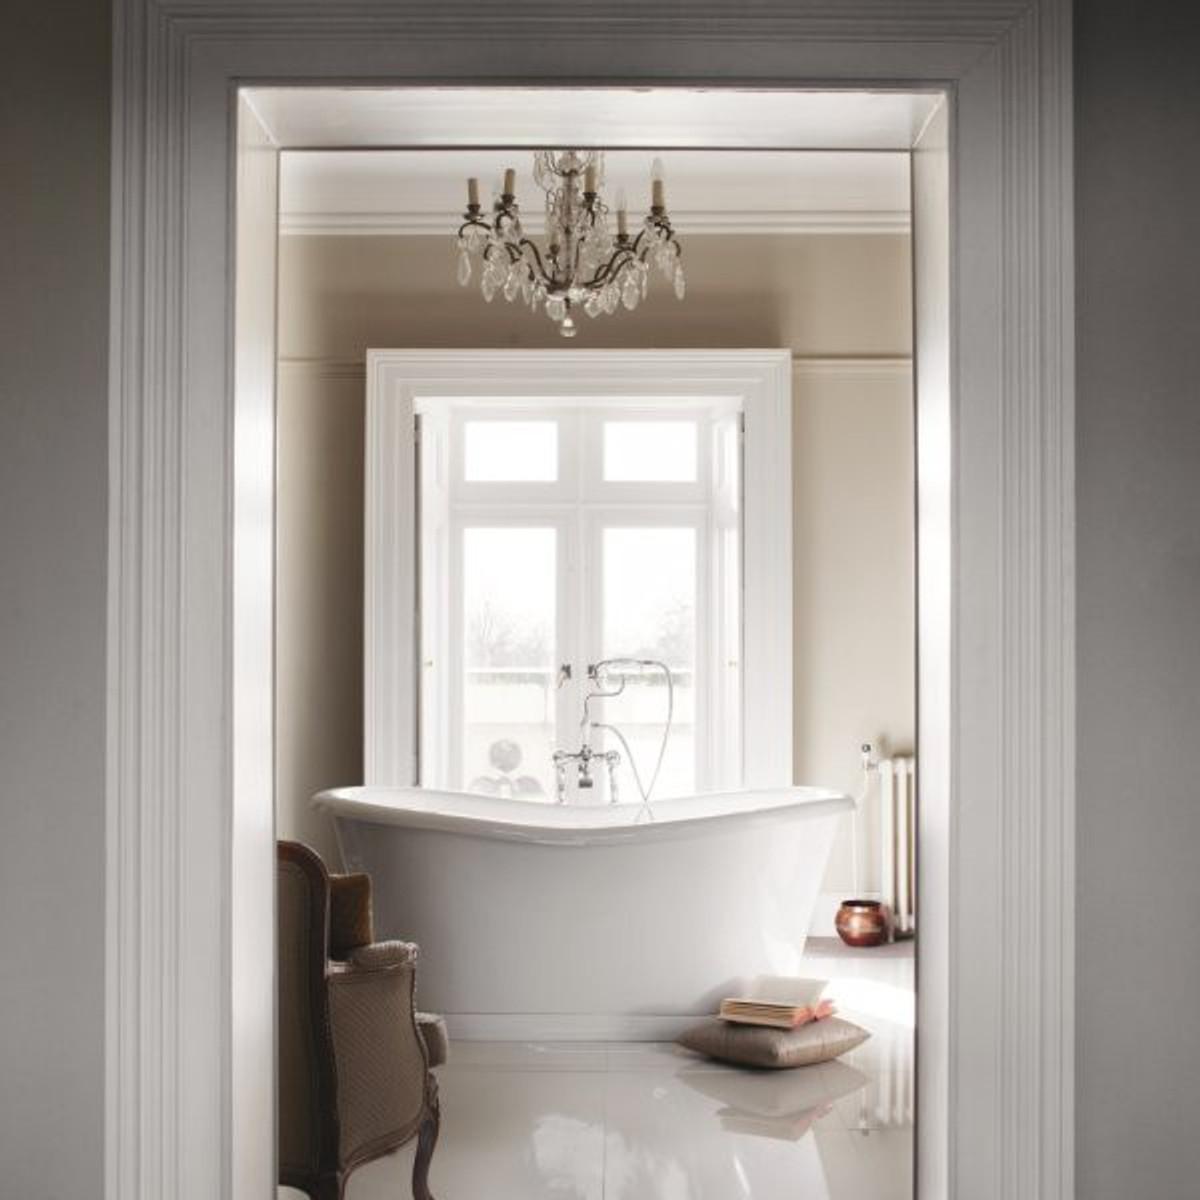 Casa Padrino Bathtub Freestanding 1650mm Badm165 Freestanding Retro Antique Bathtub